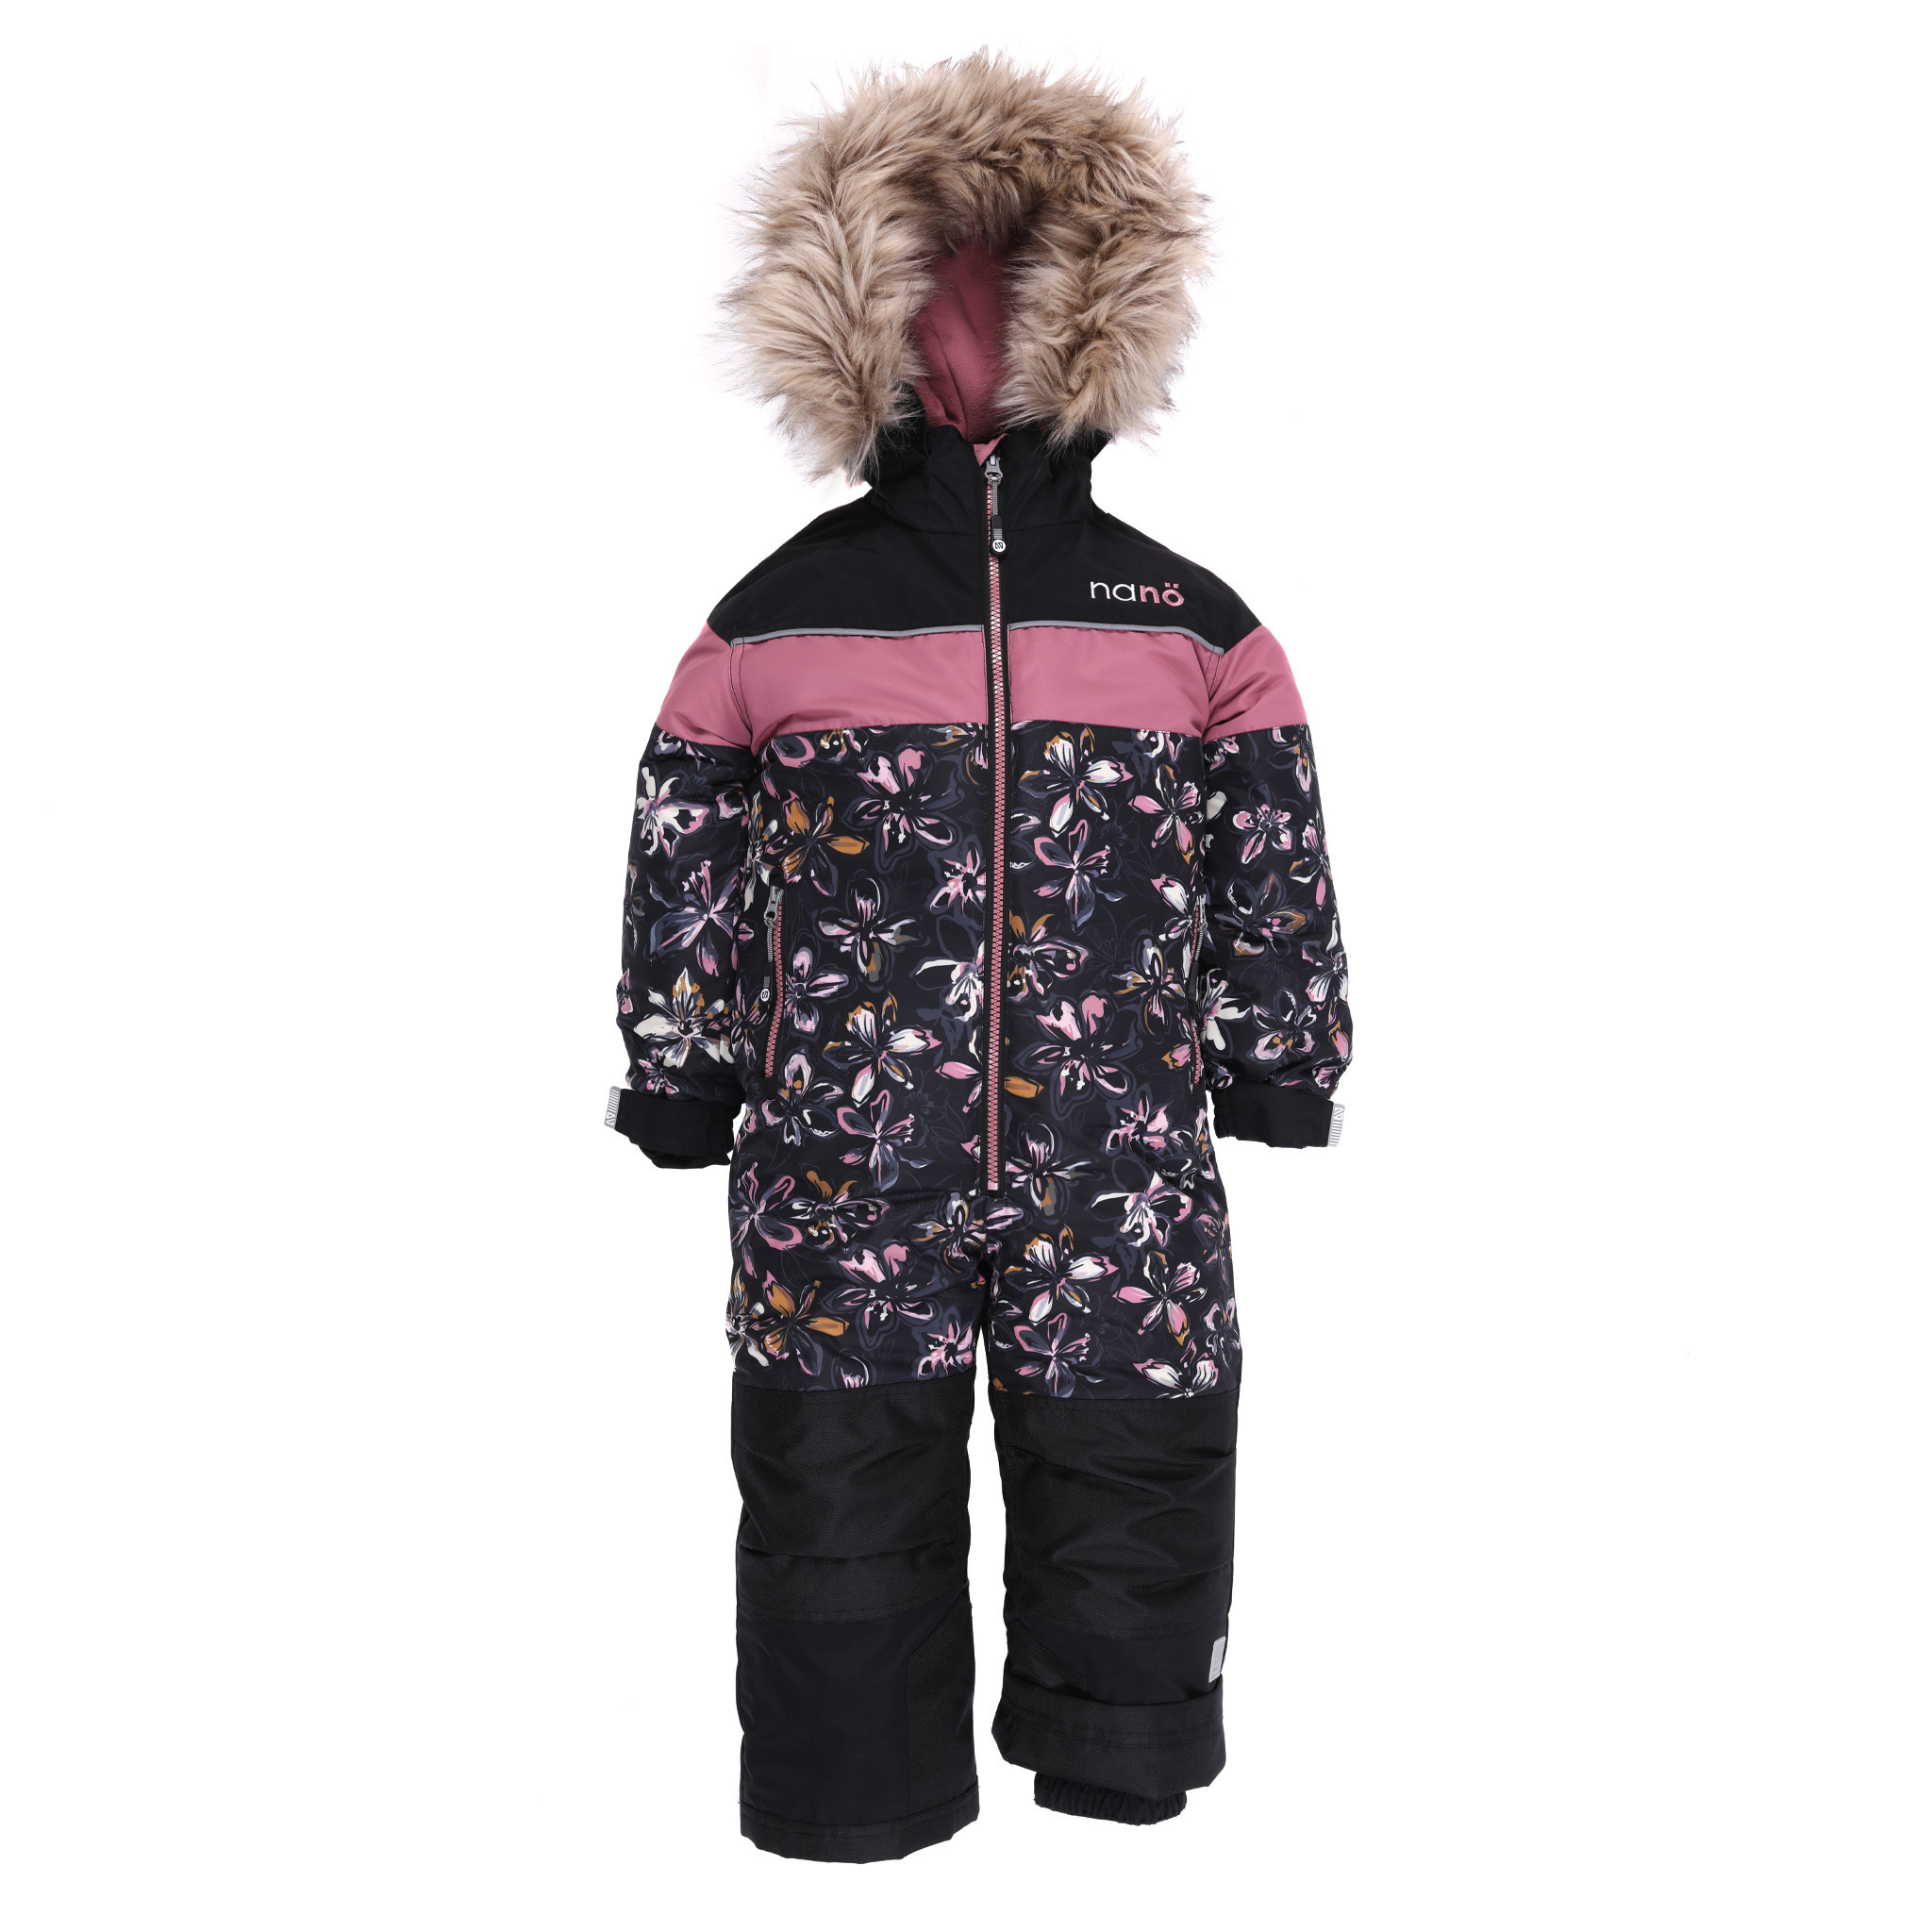 Habit de neige 1 pièce - Mont Valinouet-1